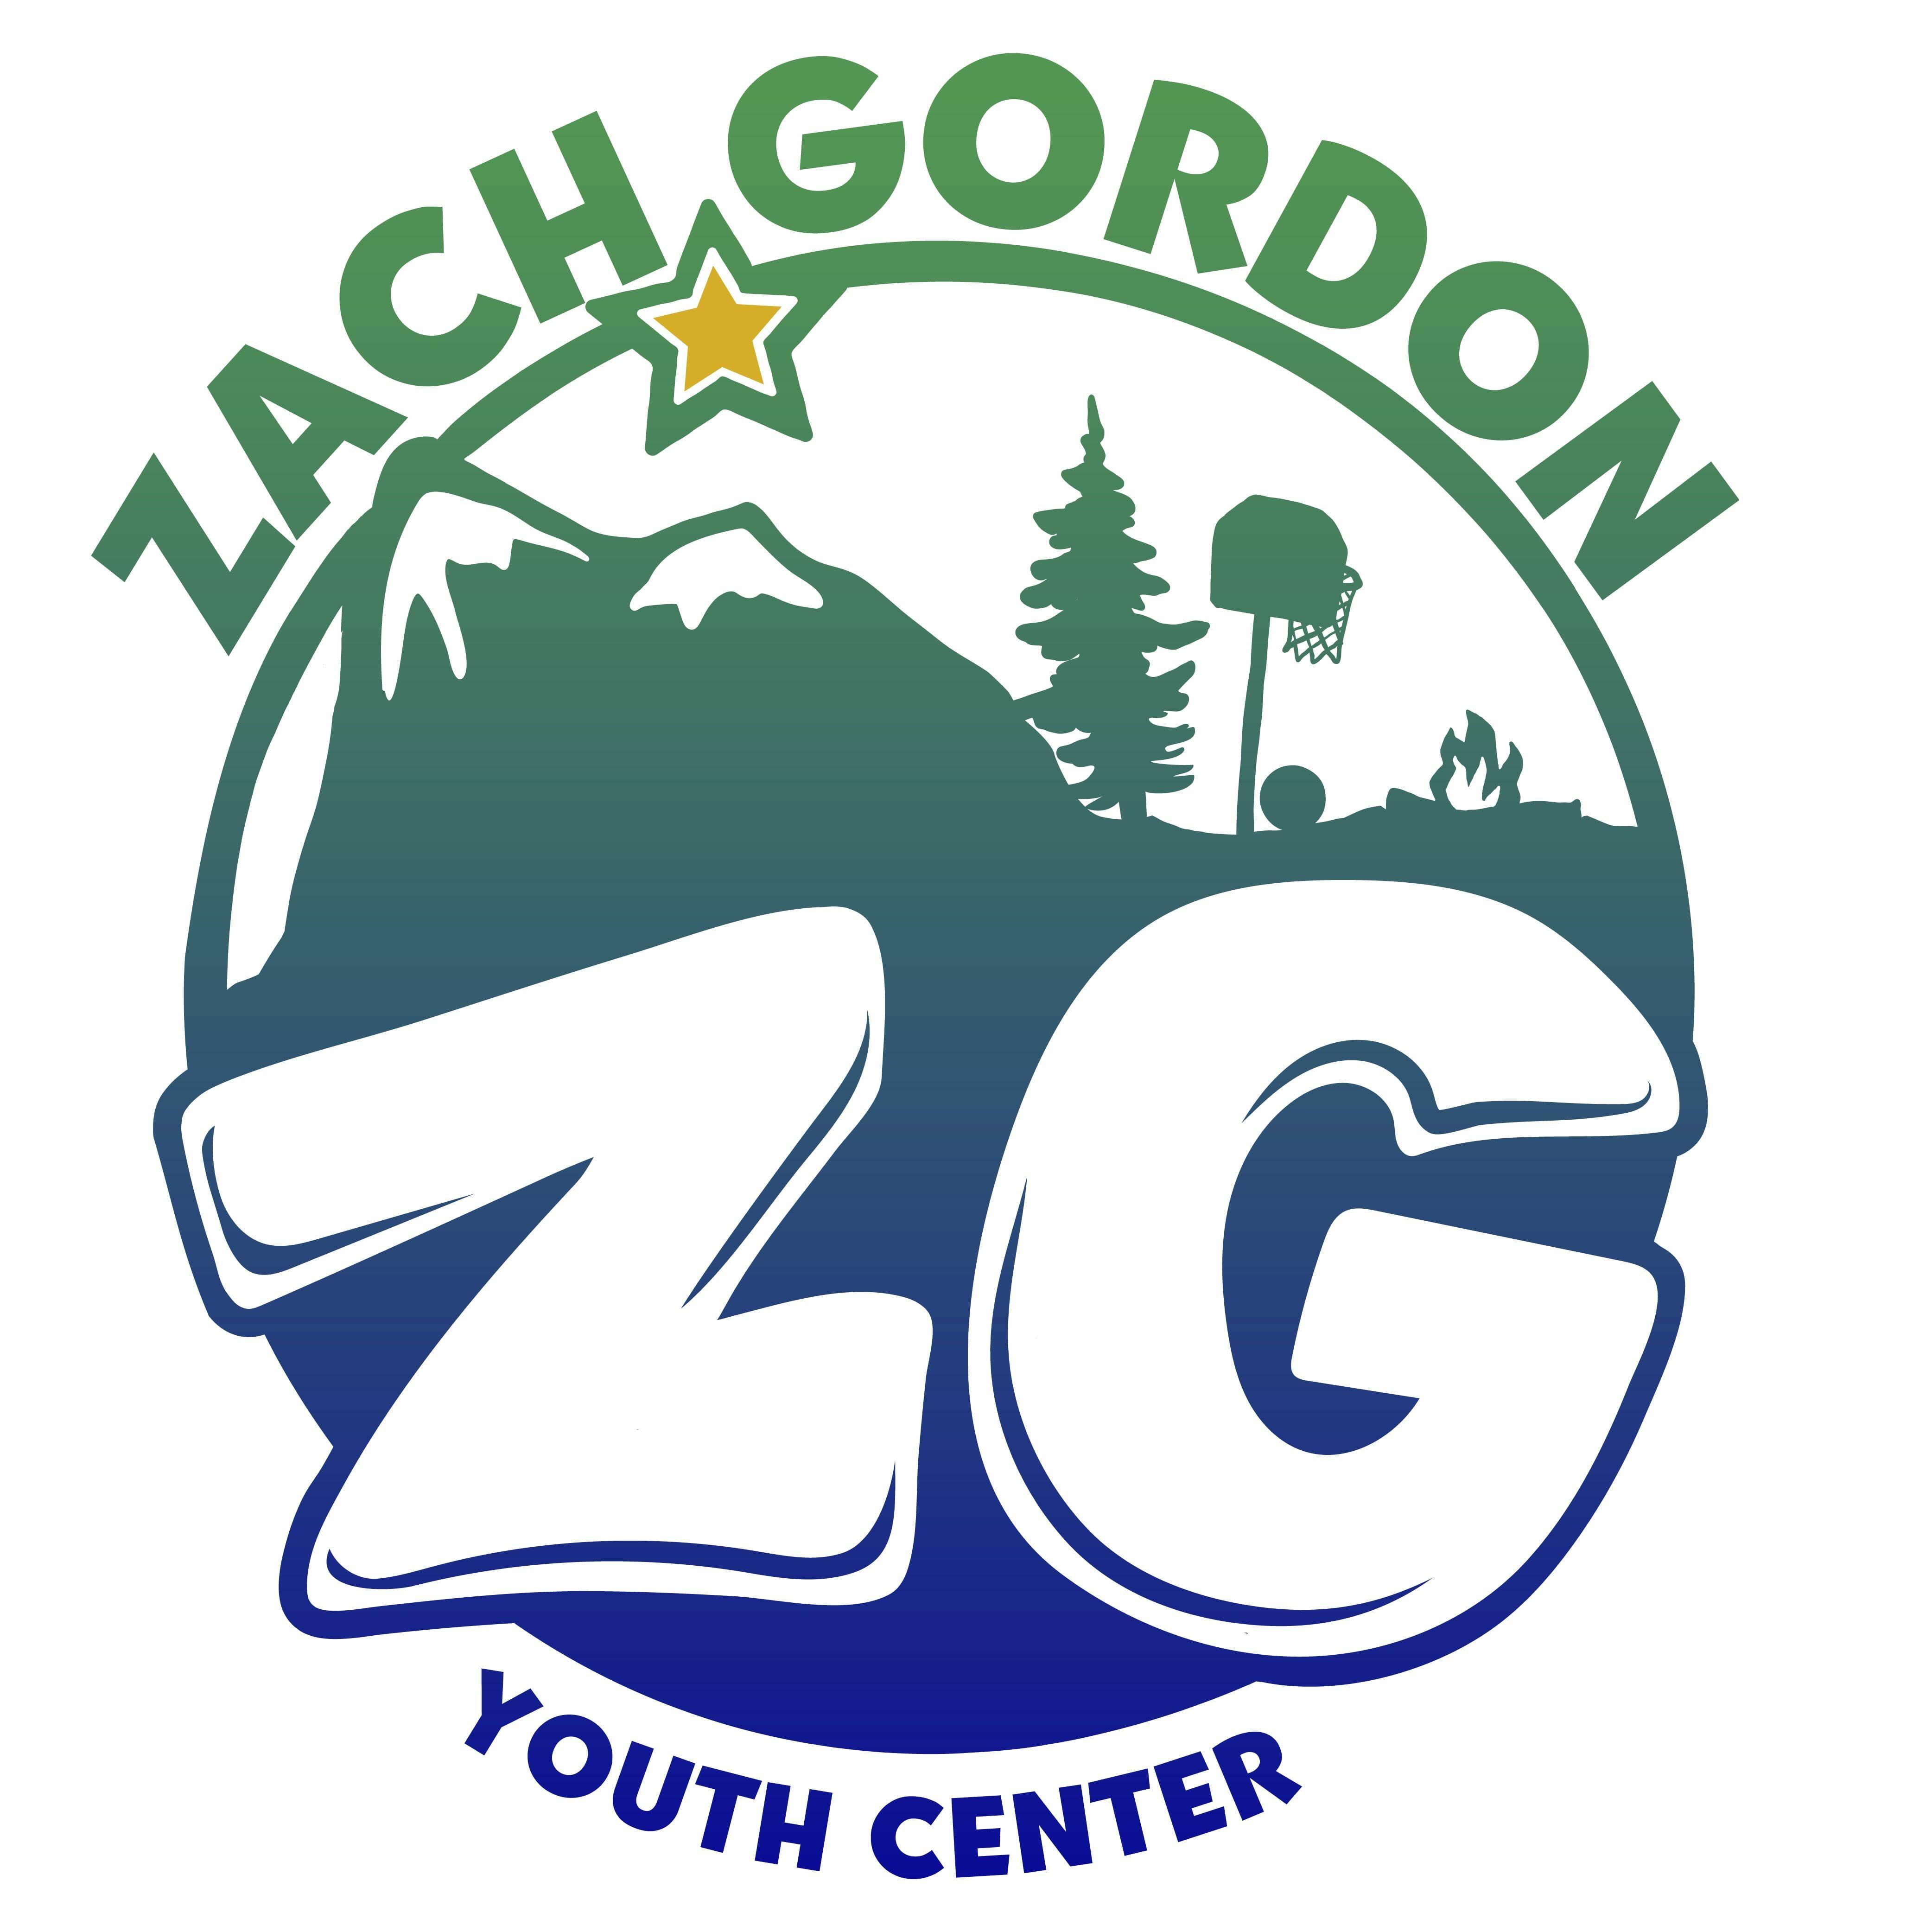 ZACH GORDON YOUTH CENTER